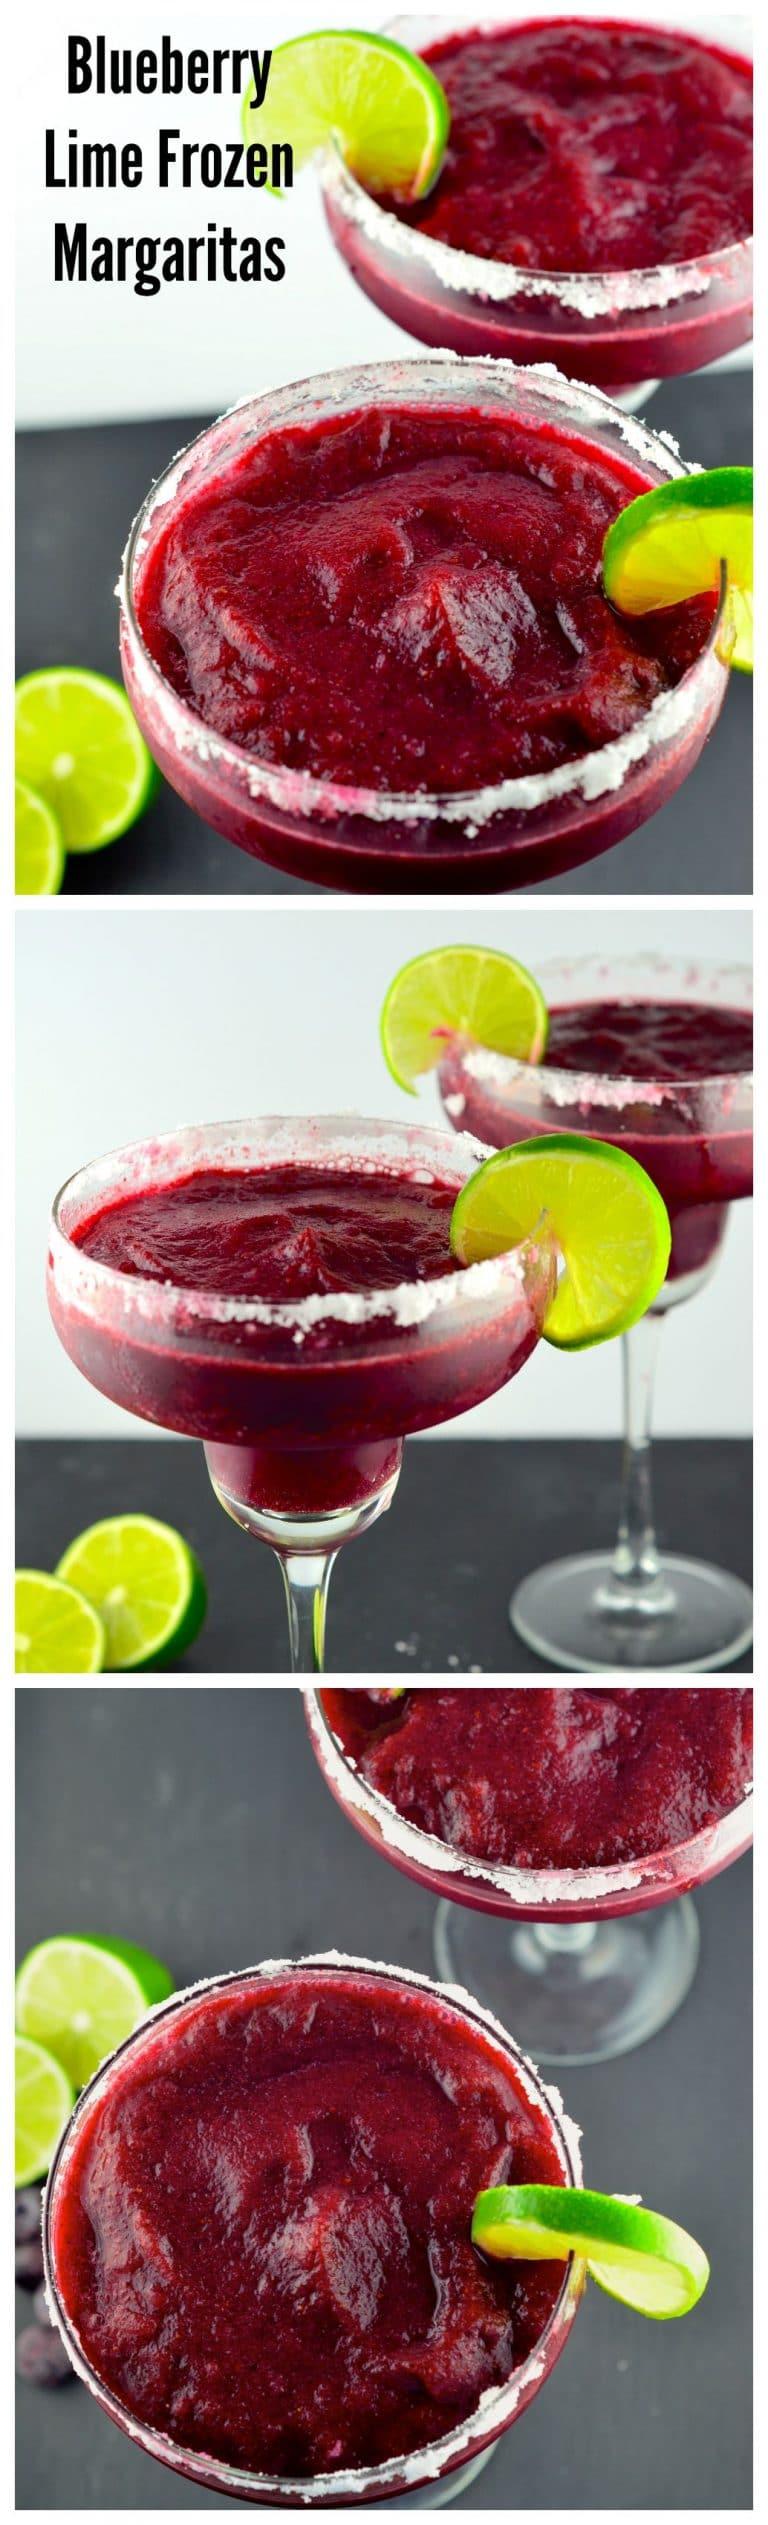 Blueberry Lime Margaritas #frozenmargaritarecipes Blueberry Lime Frozen Margaritas - May I Have That Recipe #frozenmargaritarecipes